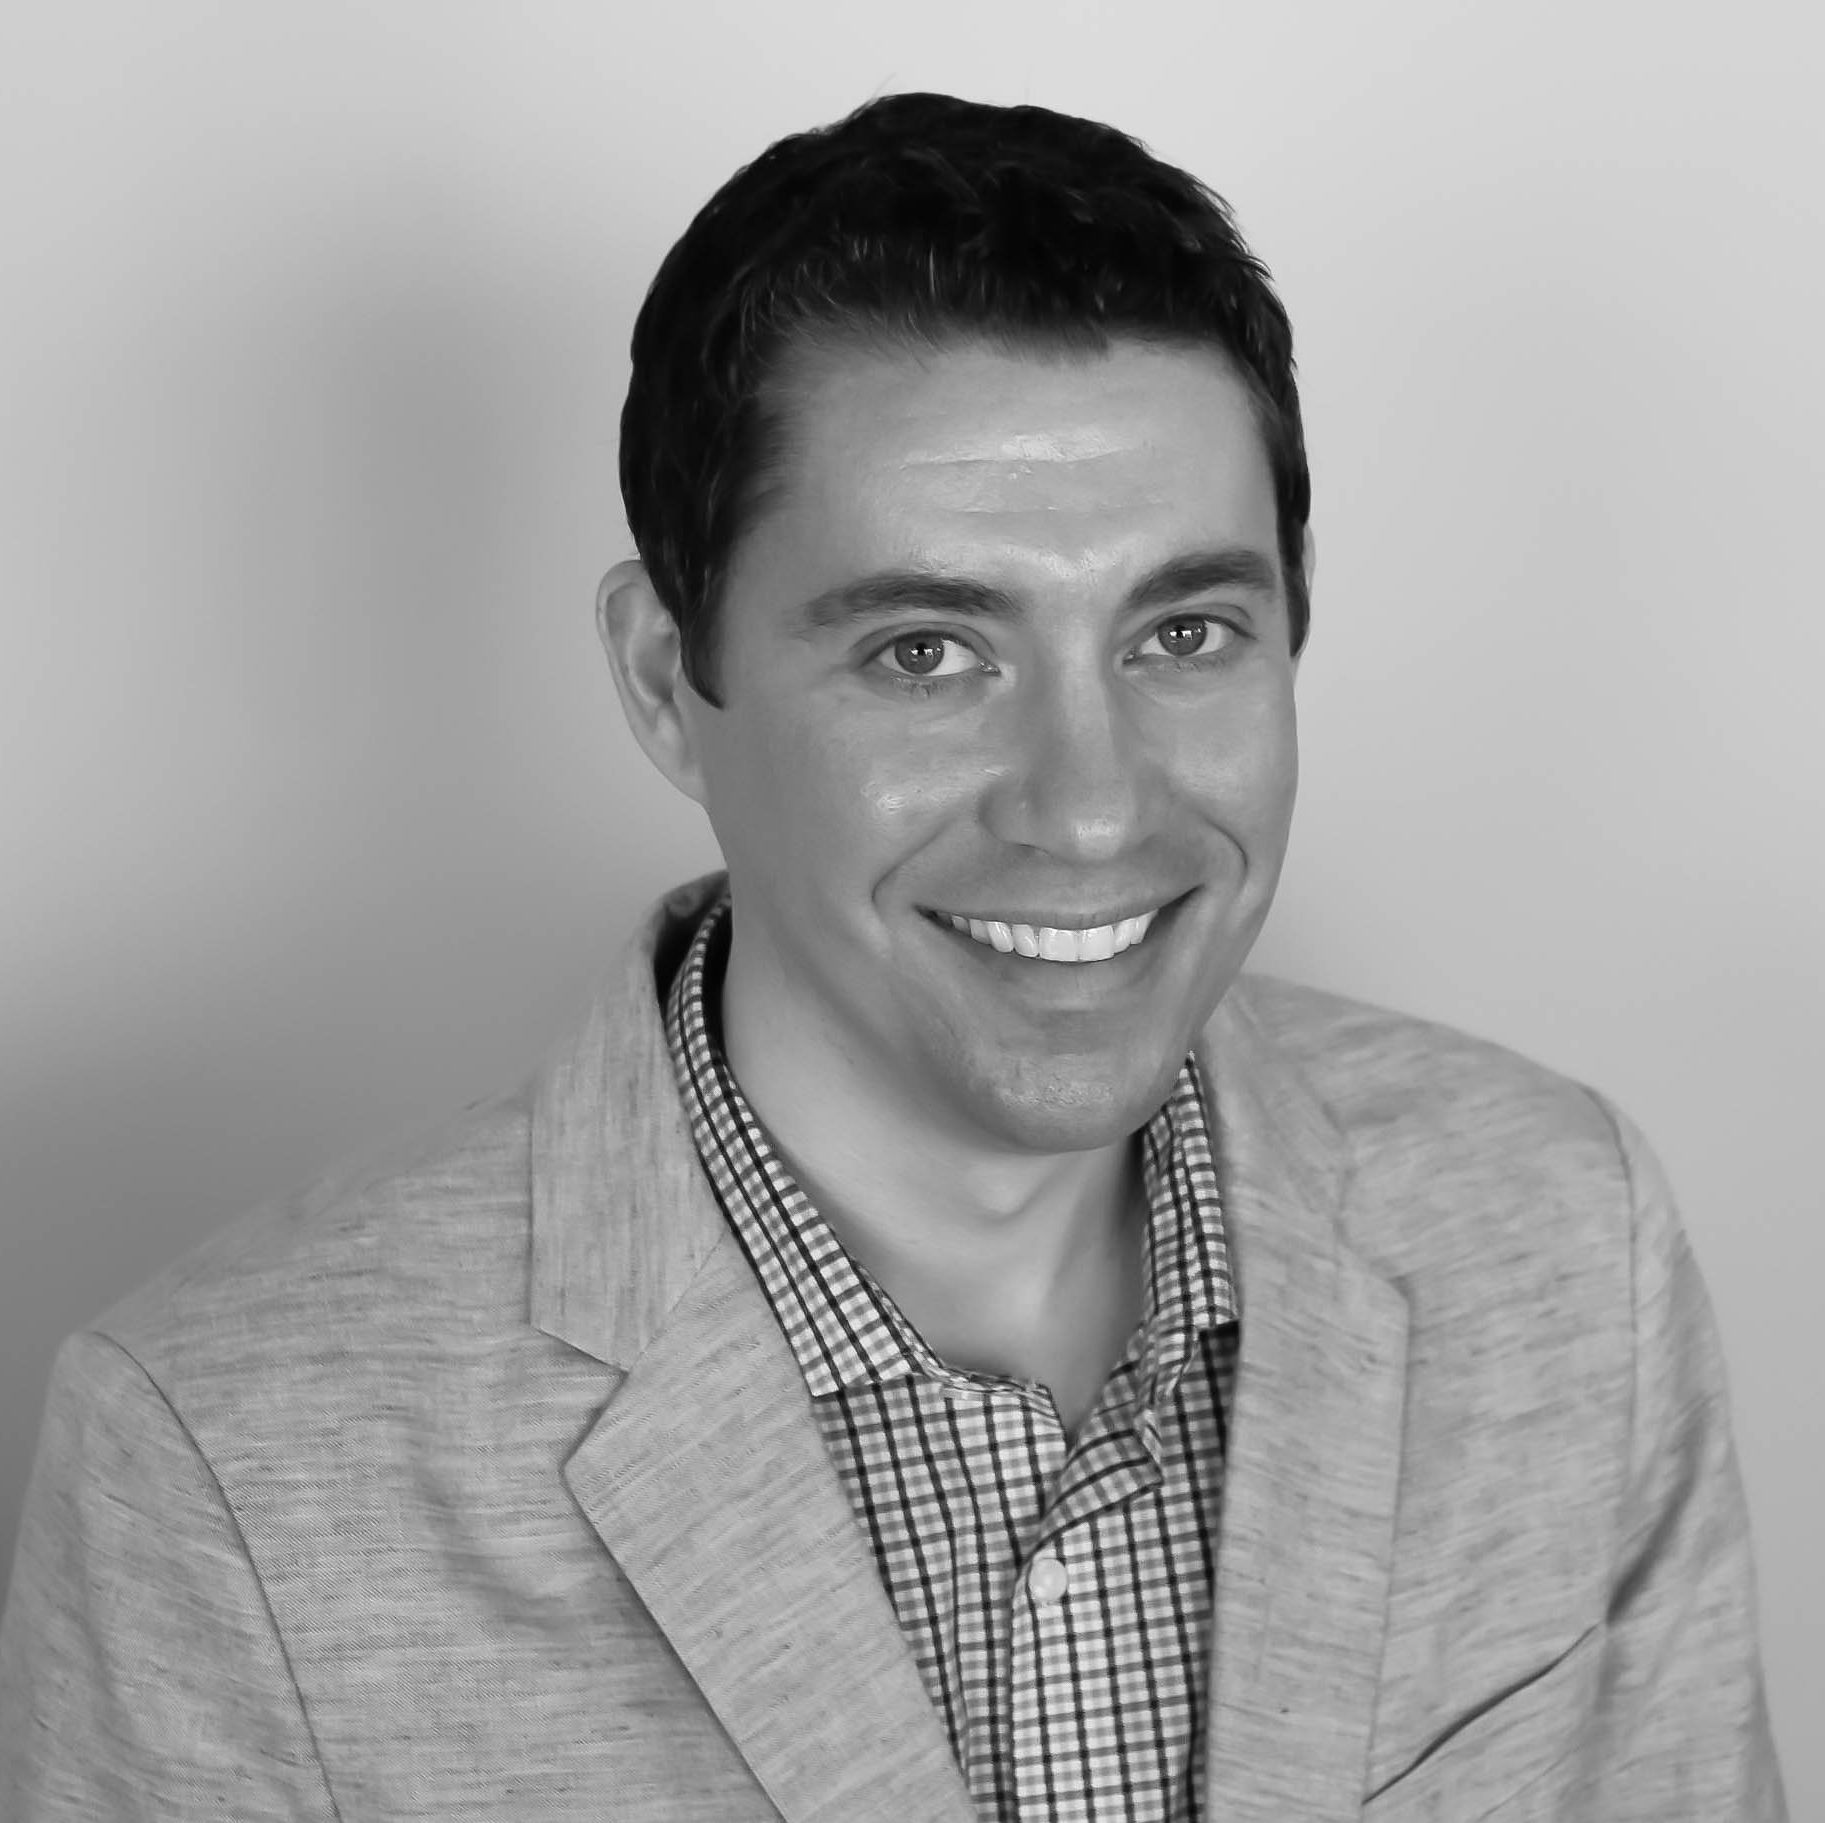 Kevin Husmann